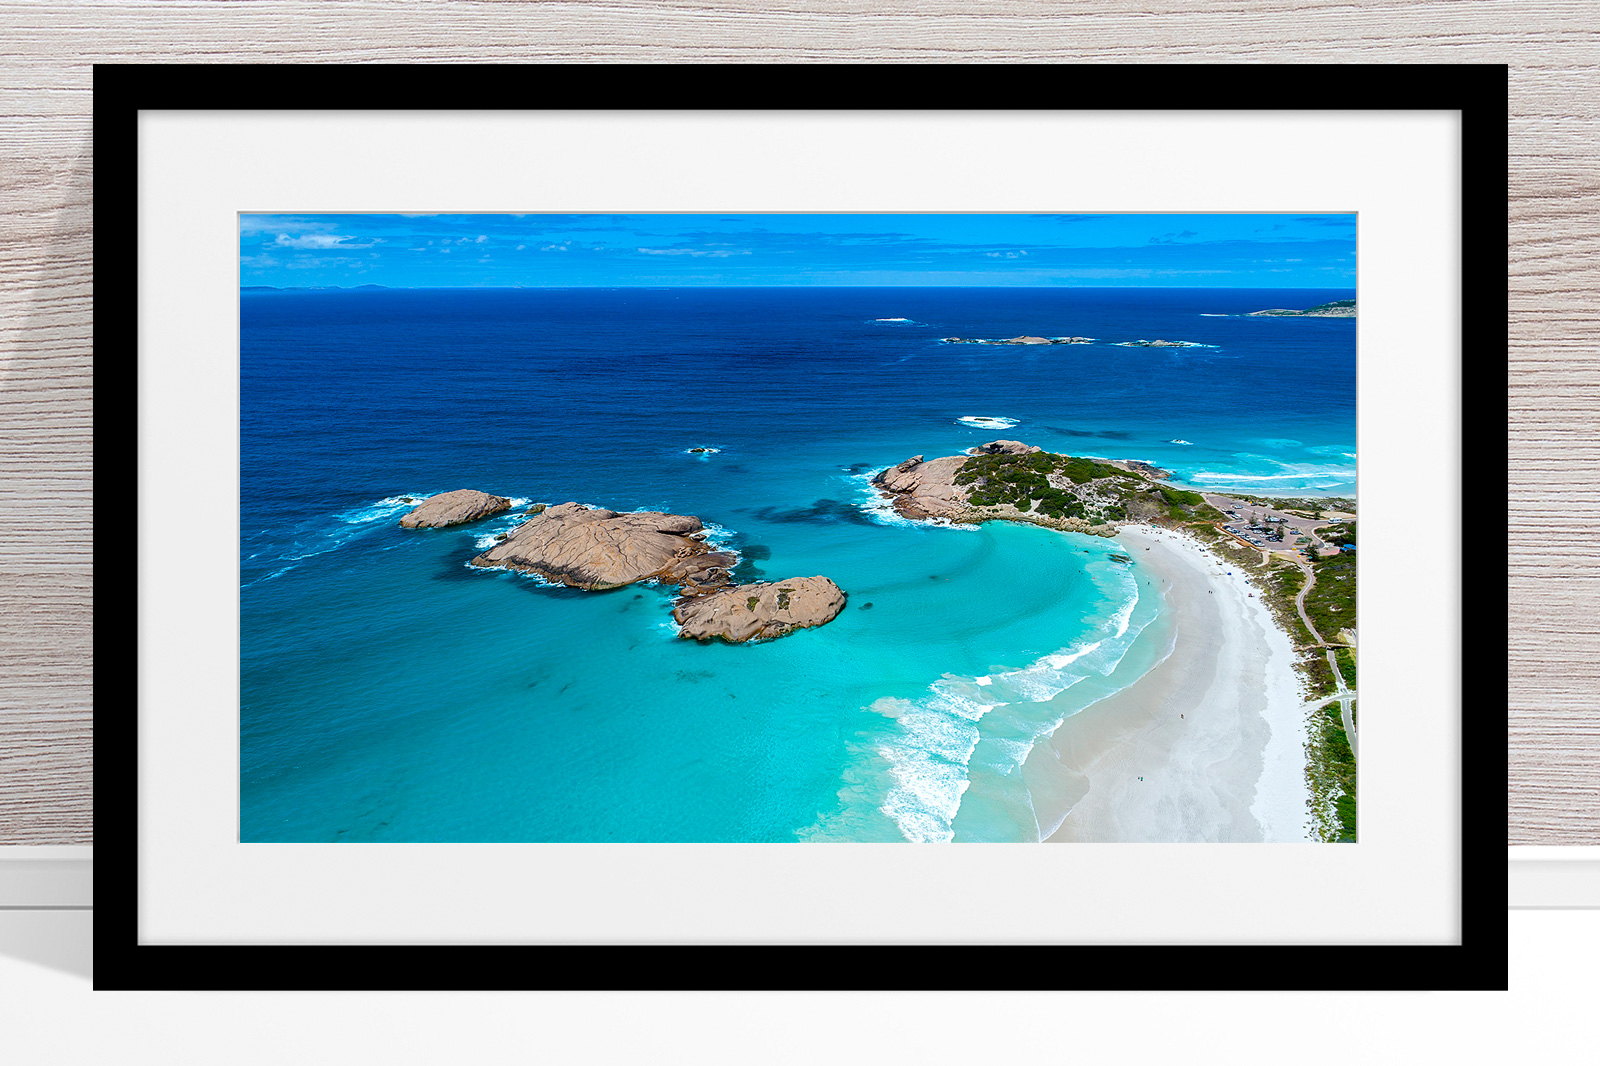 011 - Jason Mazur - 'Twilight Beach Aerial, Esperance' Black Frame